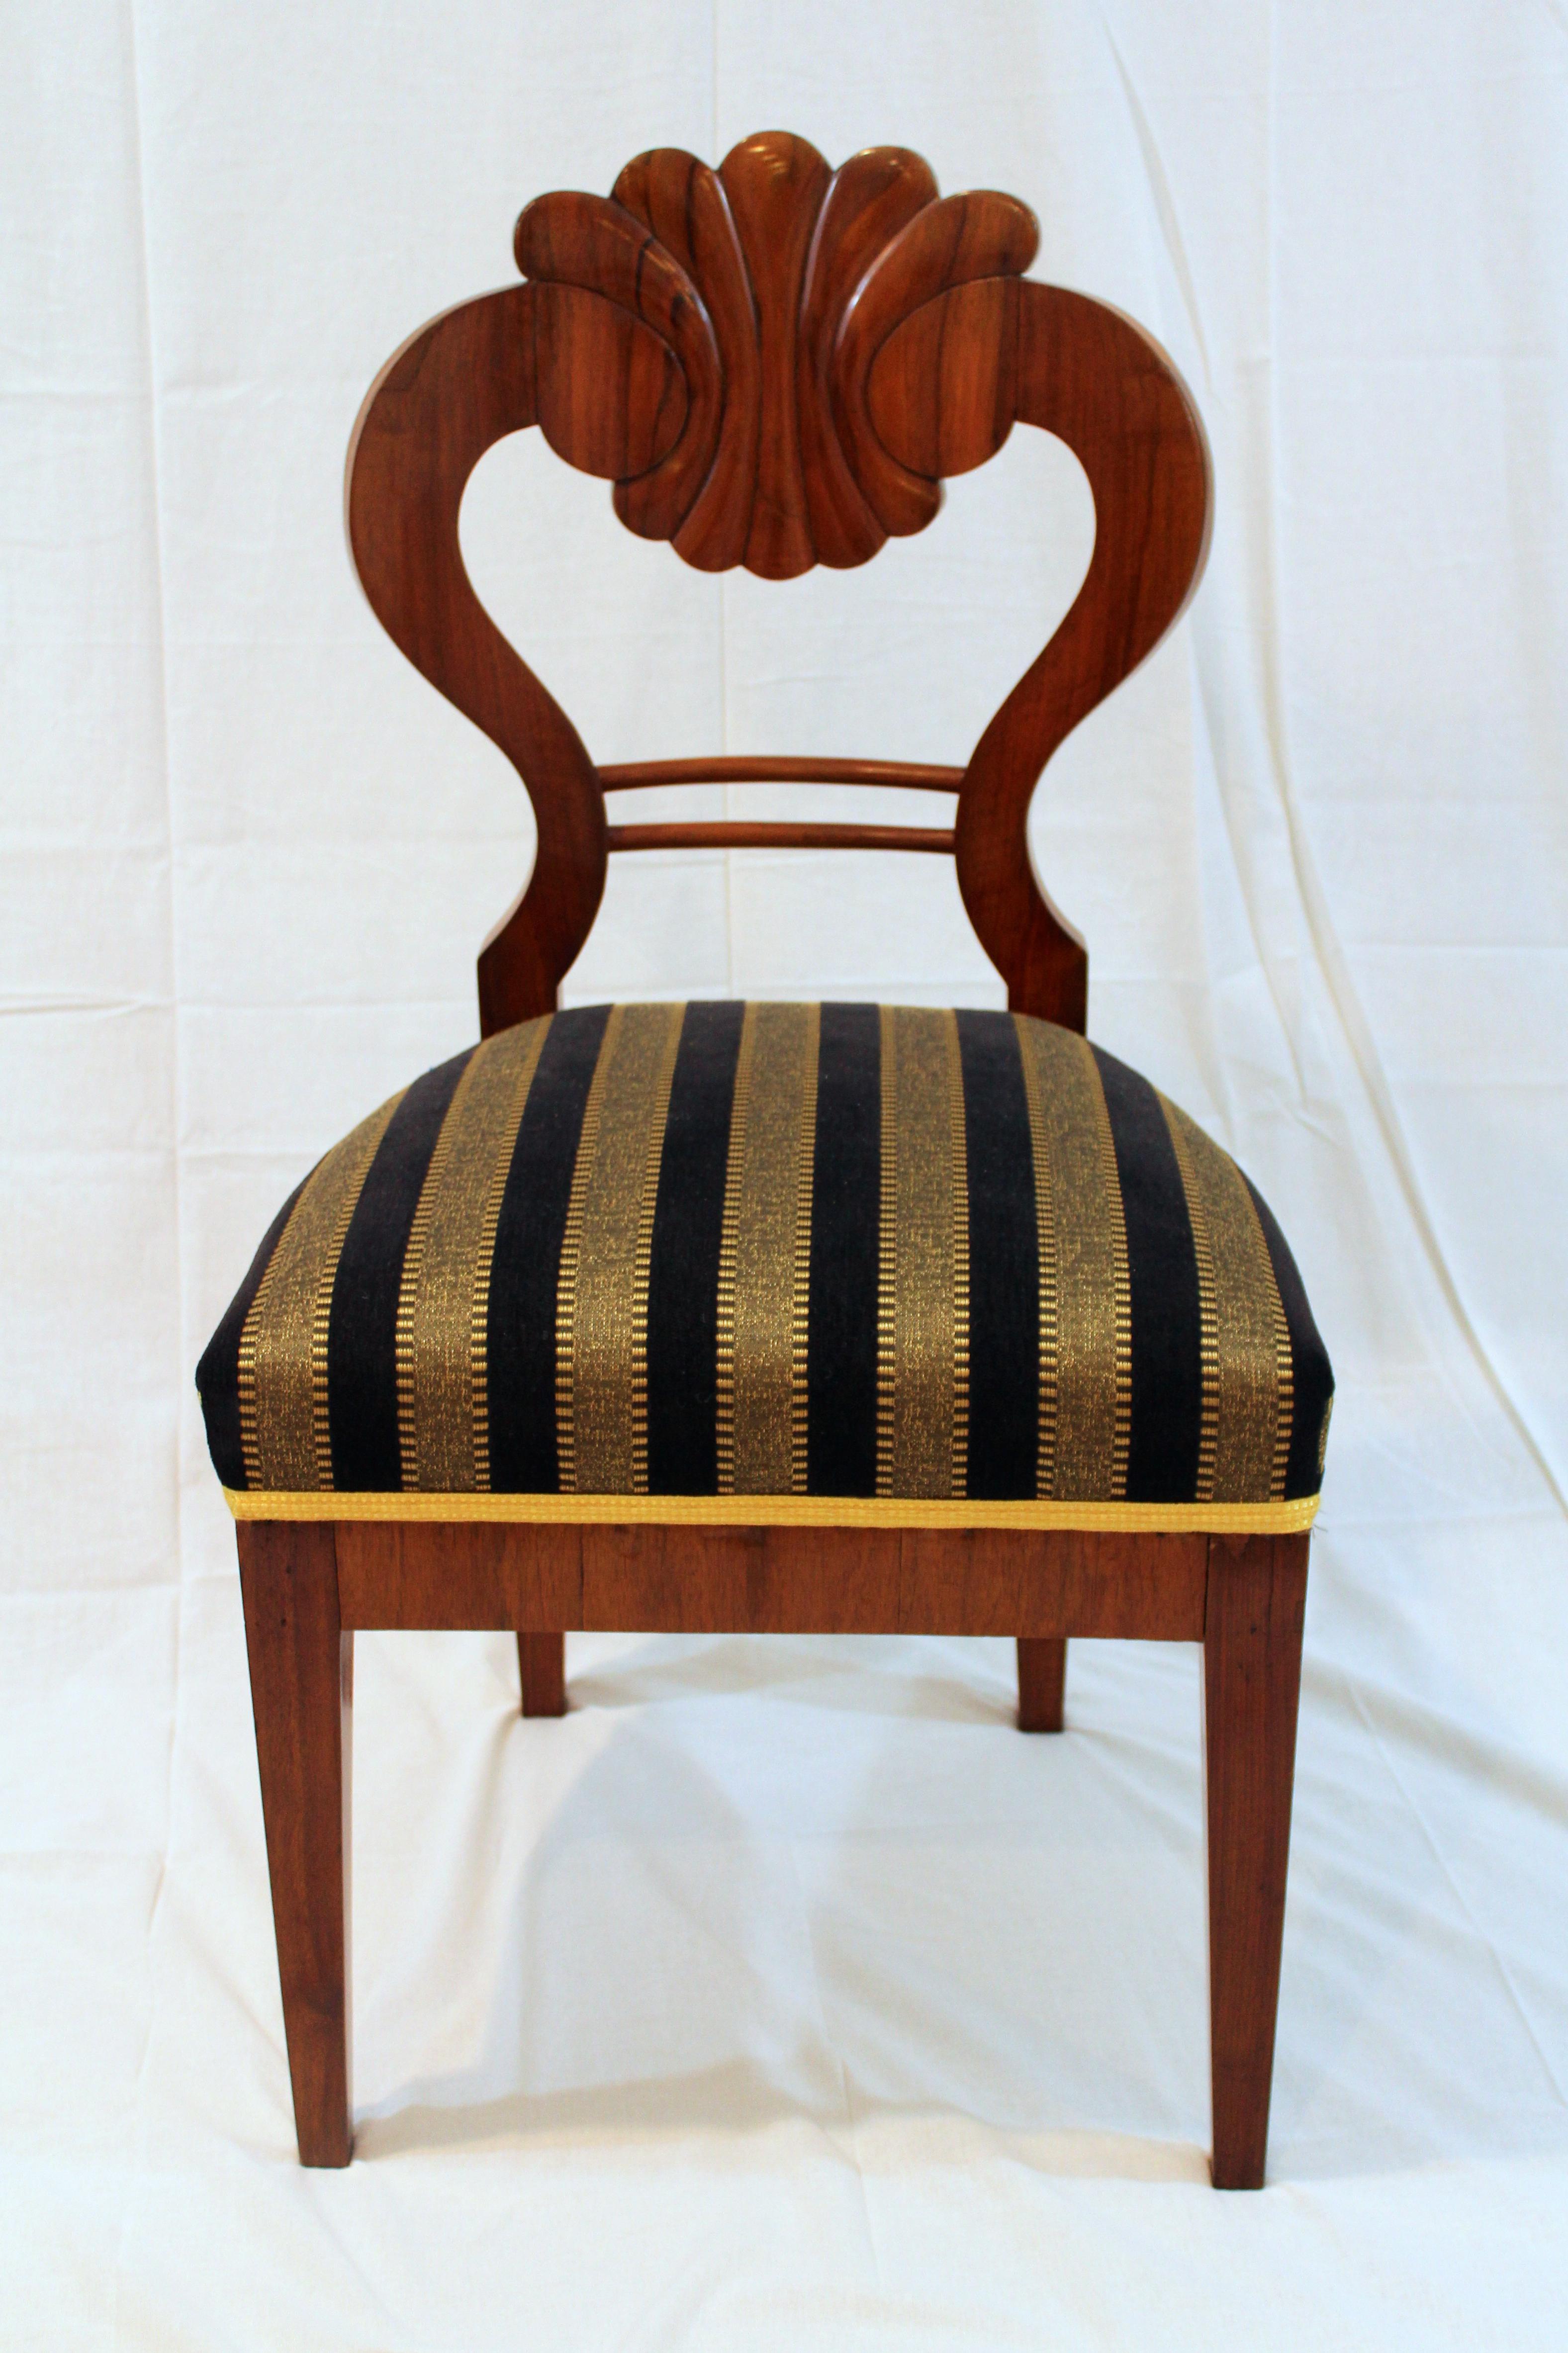 Superb Antique 1820u0027s Biedermeier Chairs   Set Of 4   Image 3 ...